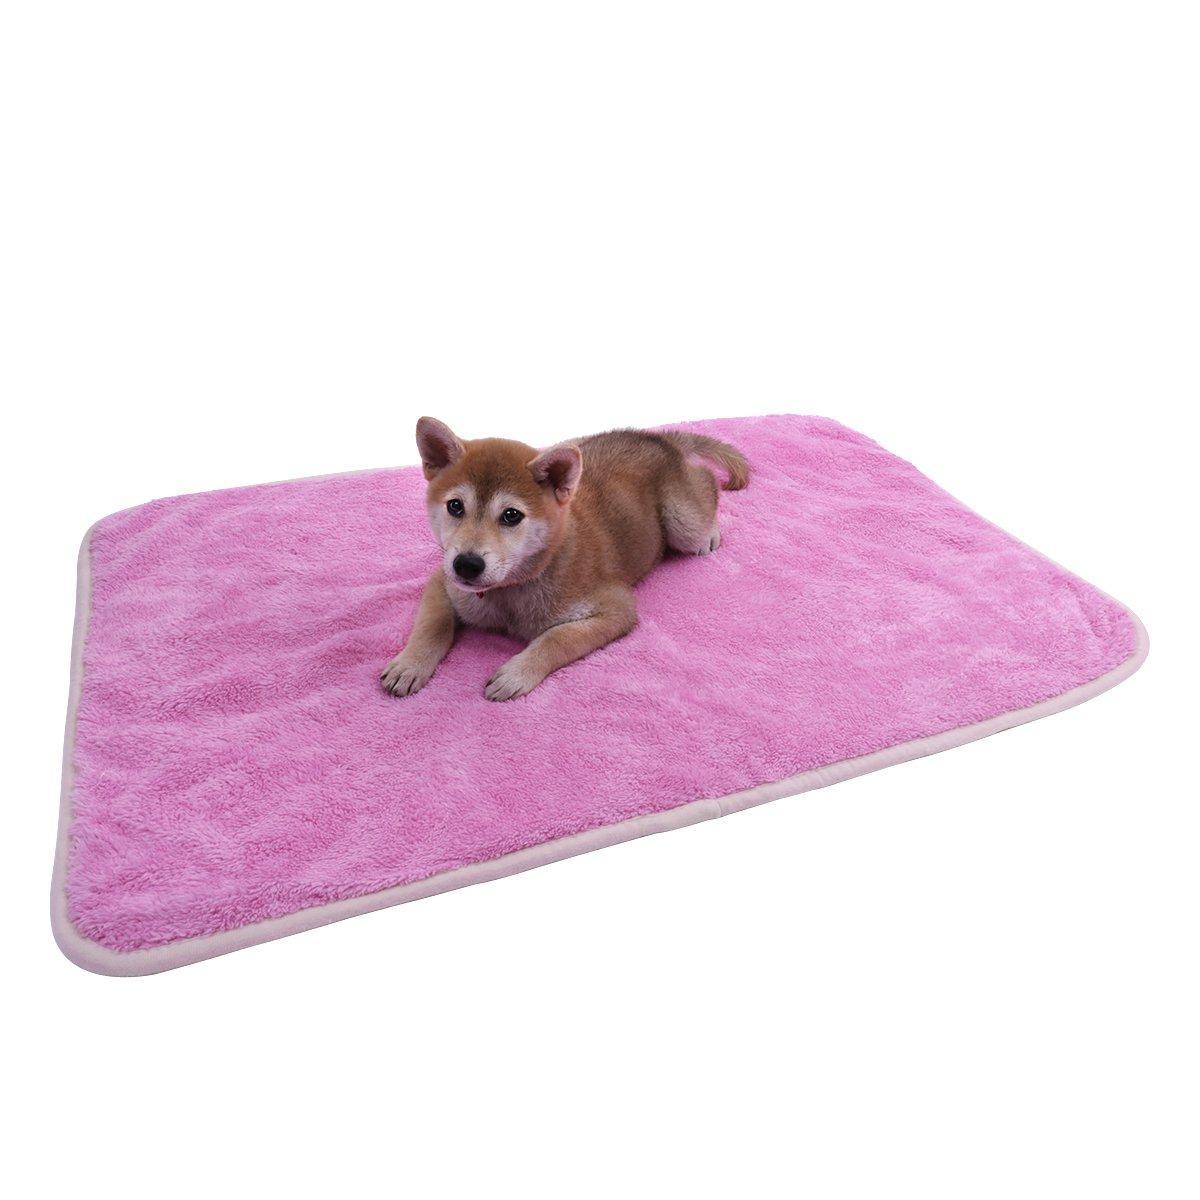 Speedy Pet Puppy Velvet Blanket Pet Cushion Small Dog Cat Bed Soft Warm Sleep Mat Rose-red S